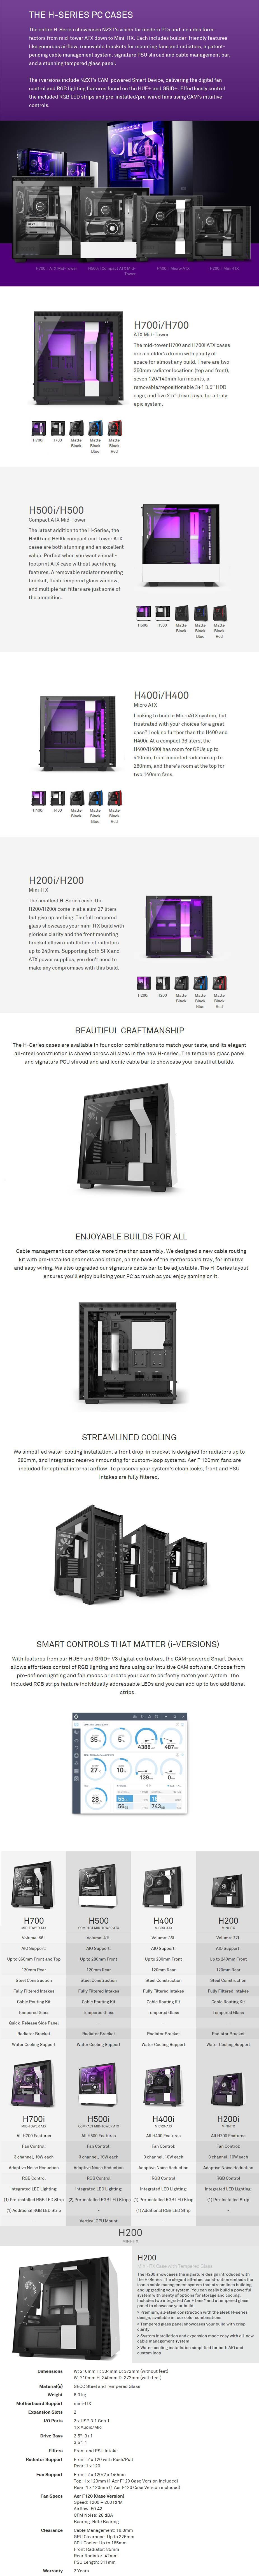 NZXT H200 Tempered Glass Mini-ITX Case - Matte White - Desktop Overview 1